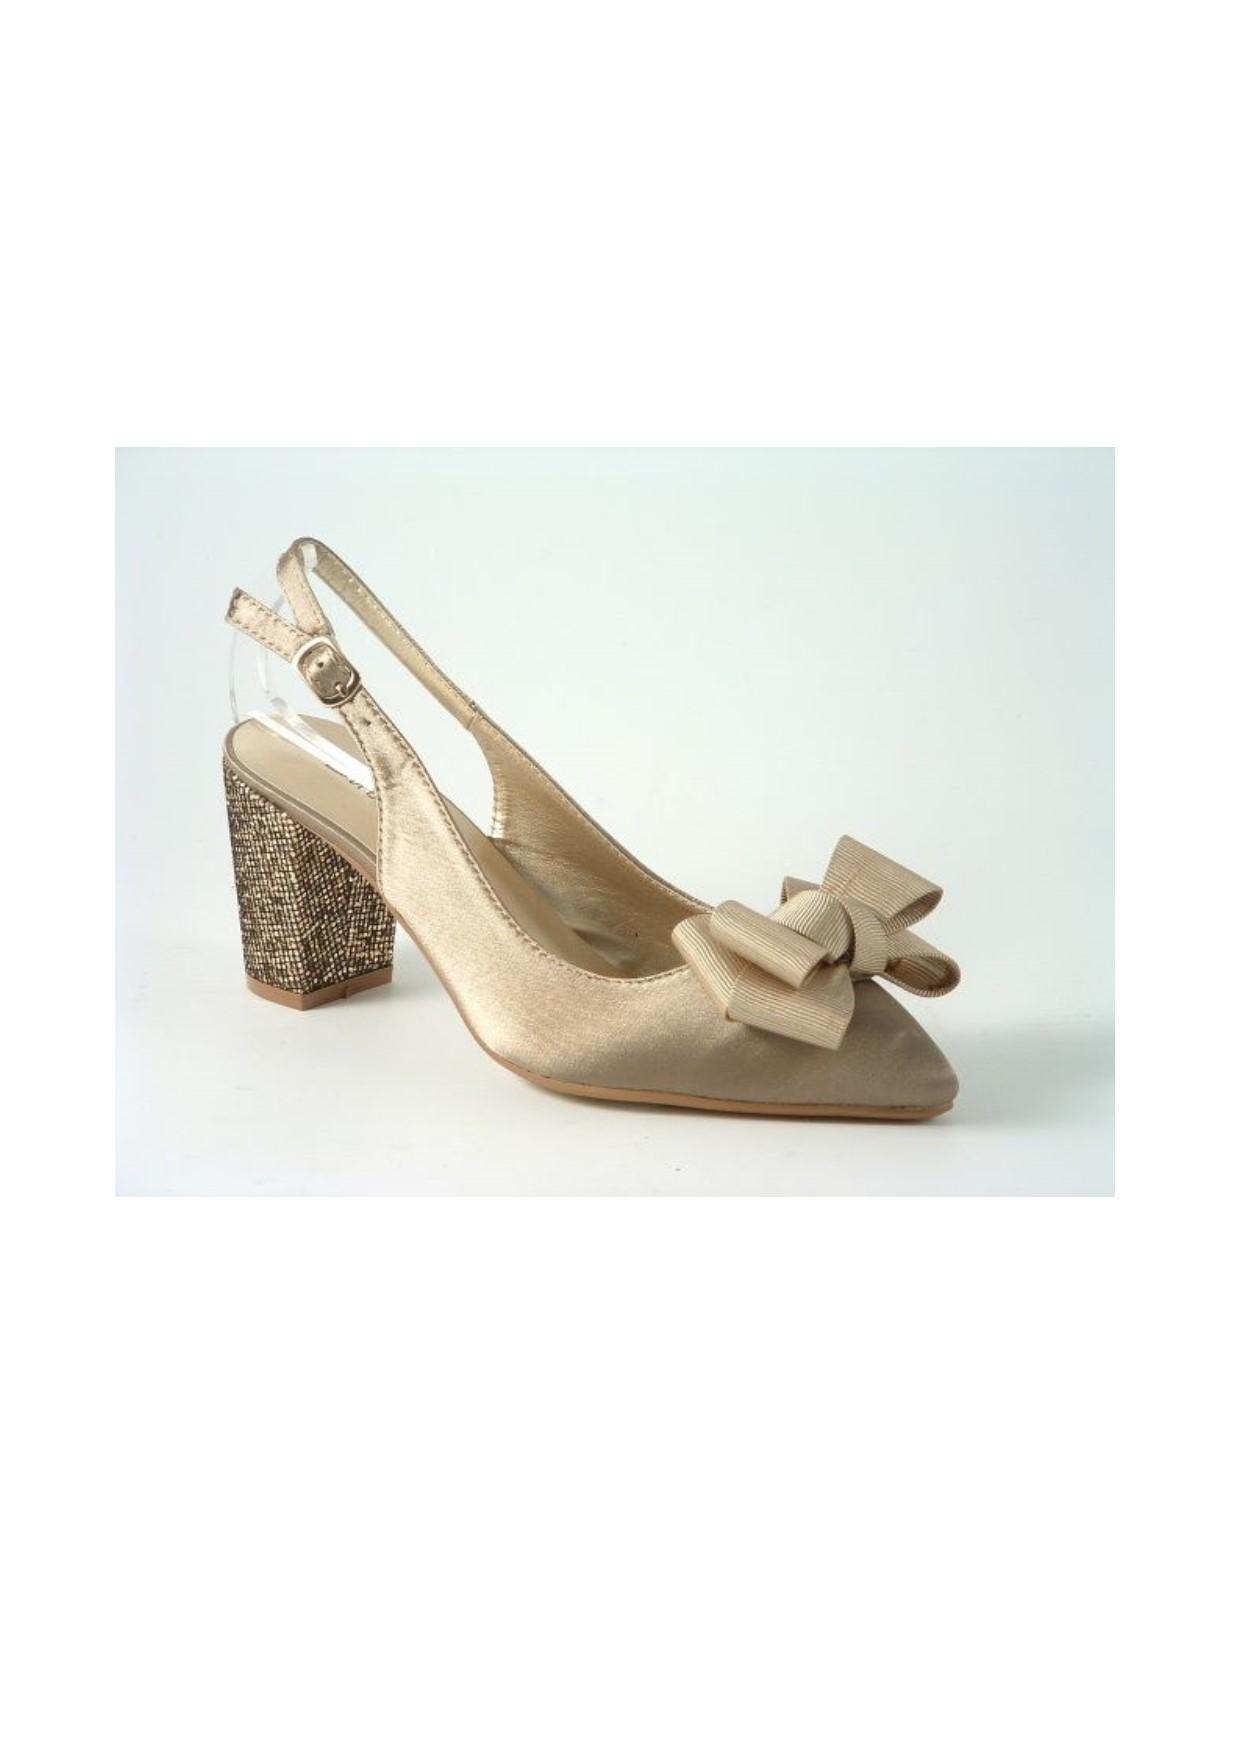 Sabatine - Champagne Satin Shoes